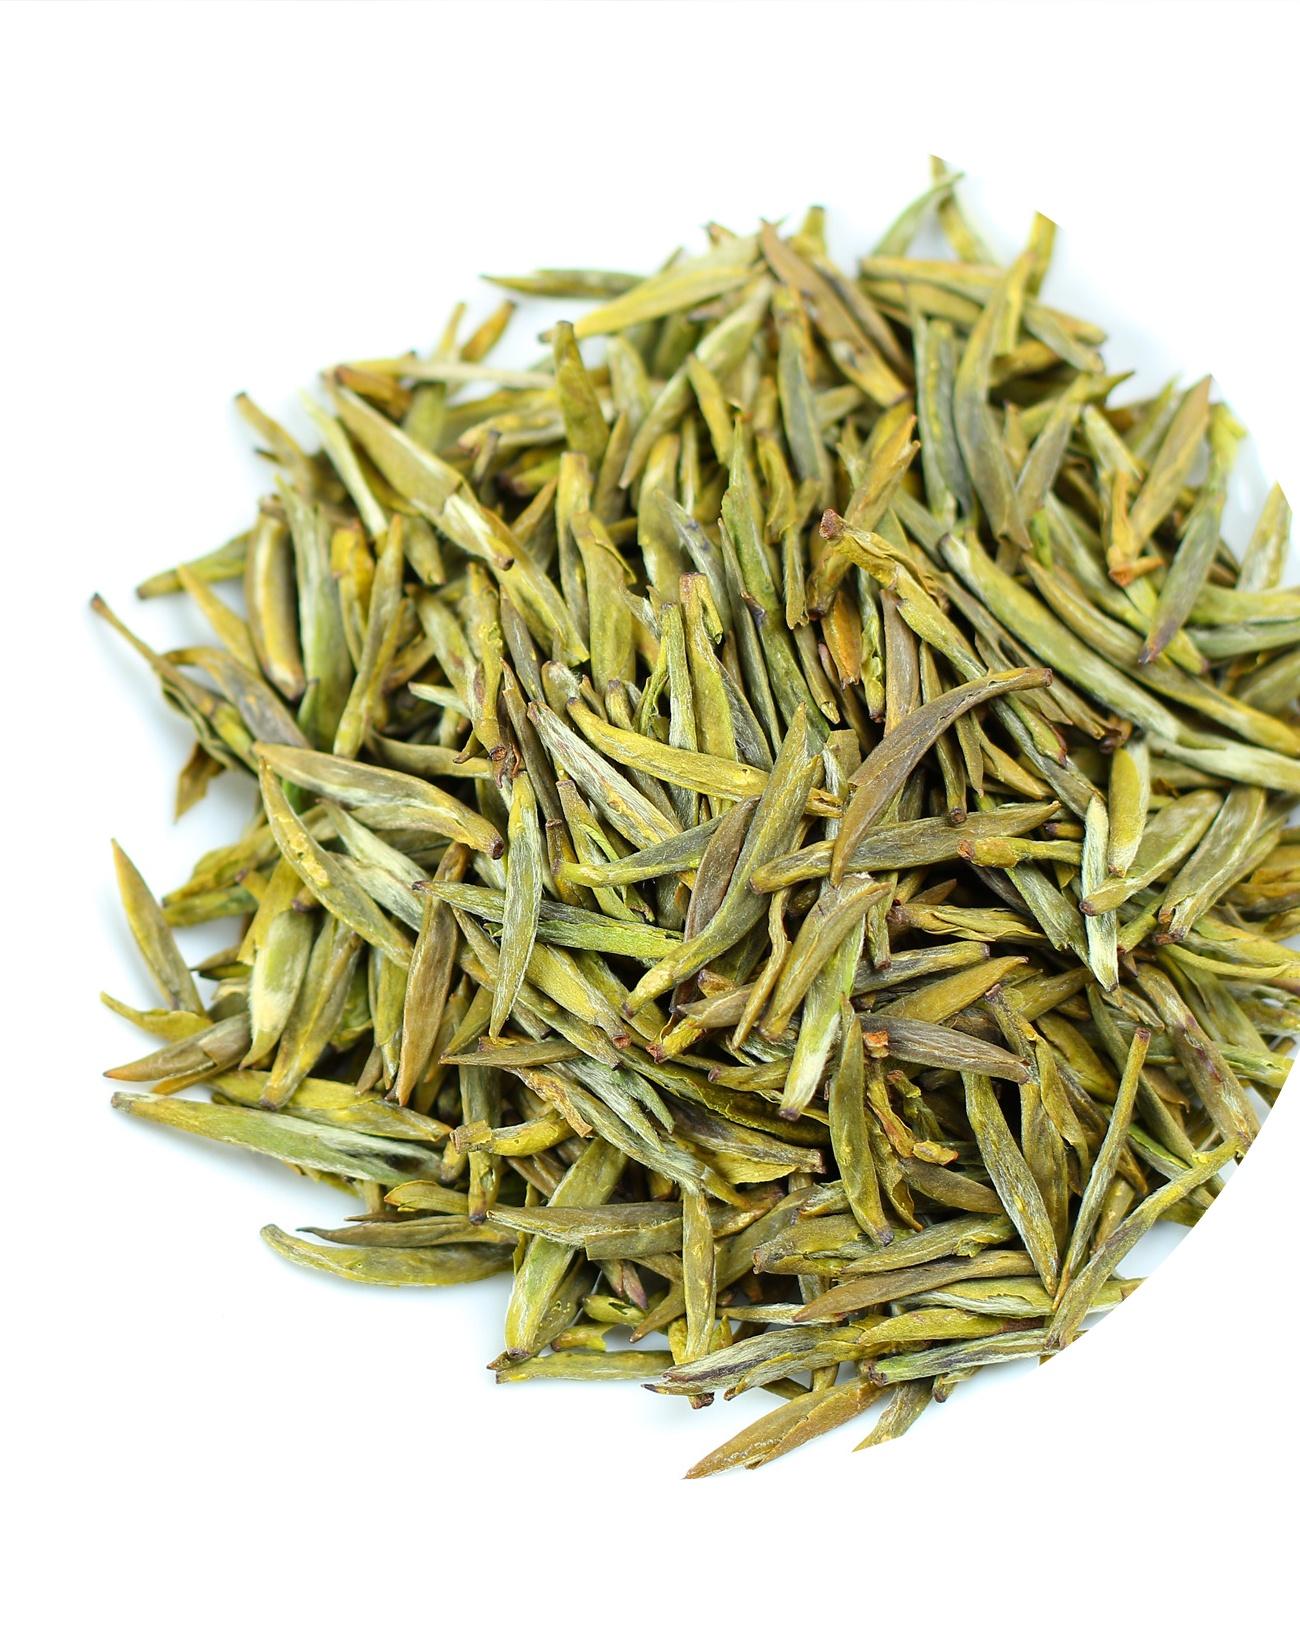 Anhui Huo Shan Huang Ya Yellow Tea - 4uTea   4uTea.com